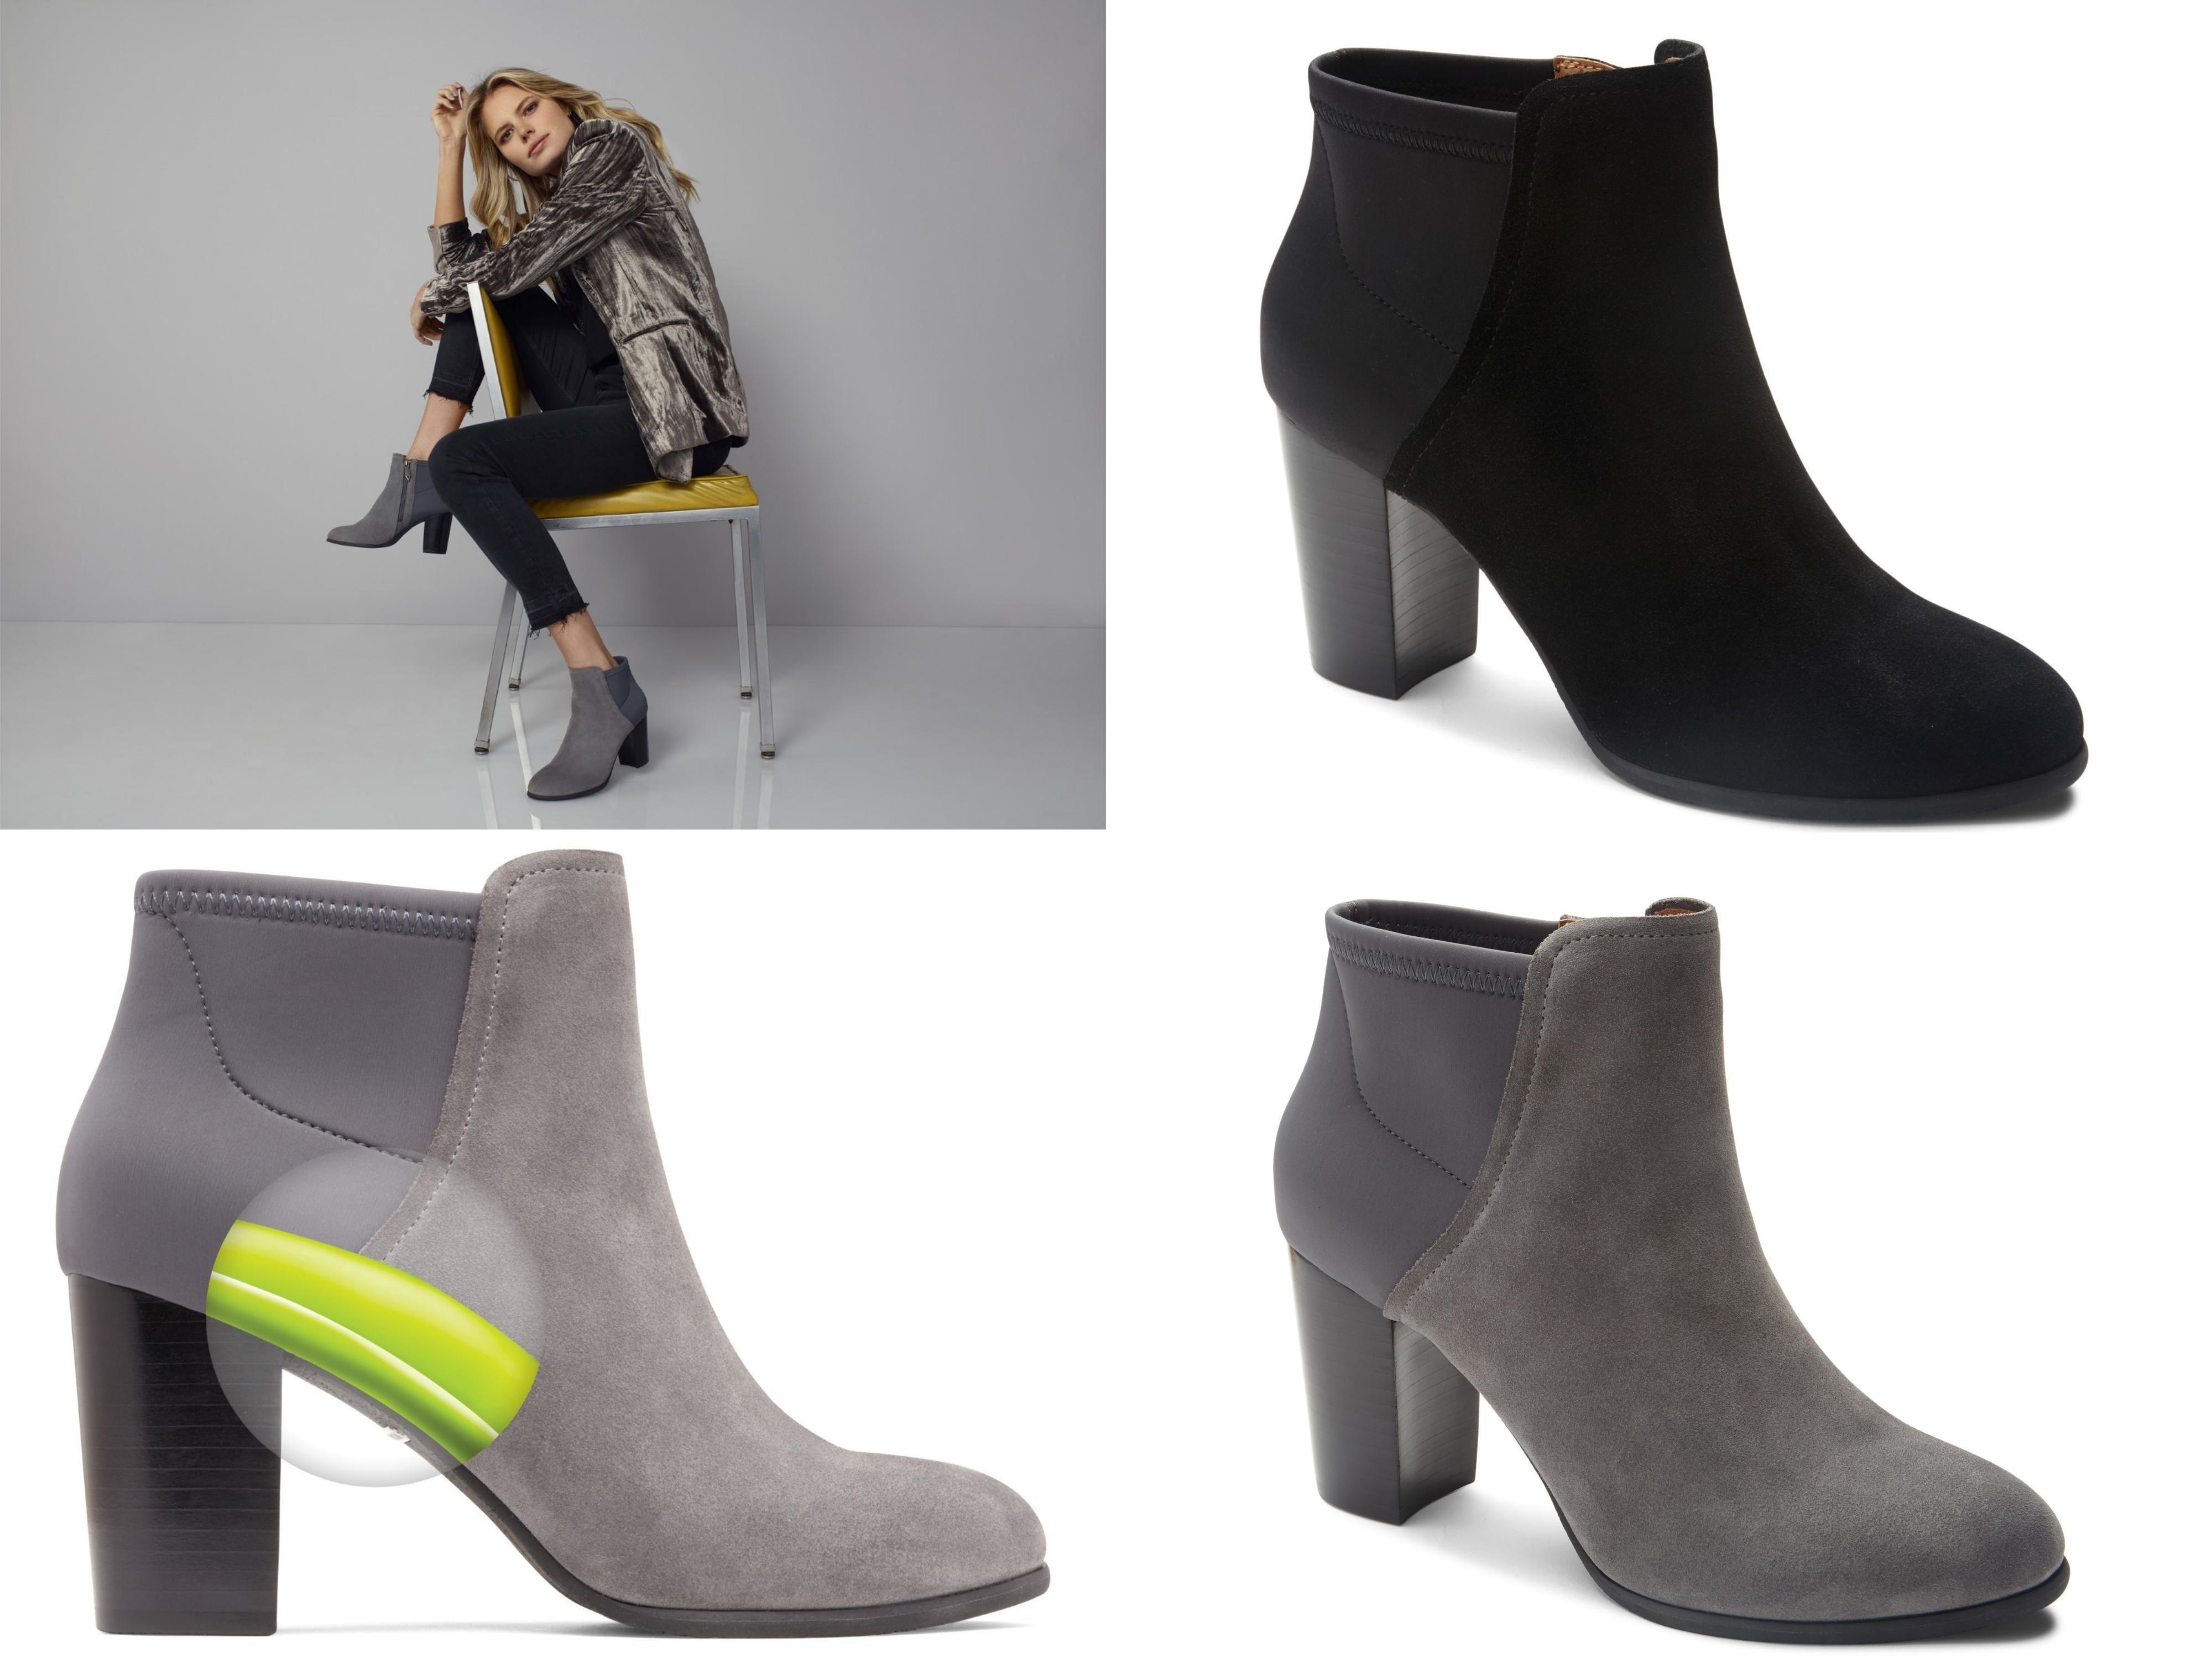 ead645c464b Vionic Perk Whitney - High Heeled Ankle Boot Black - 7 Medium ...